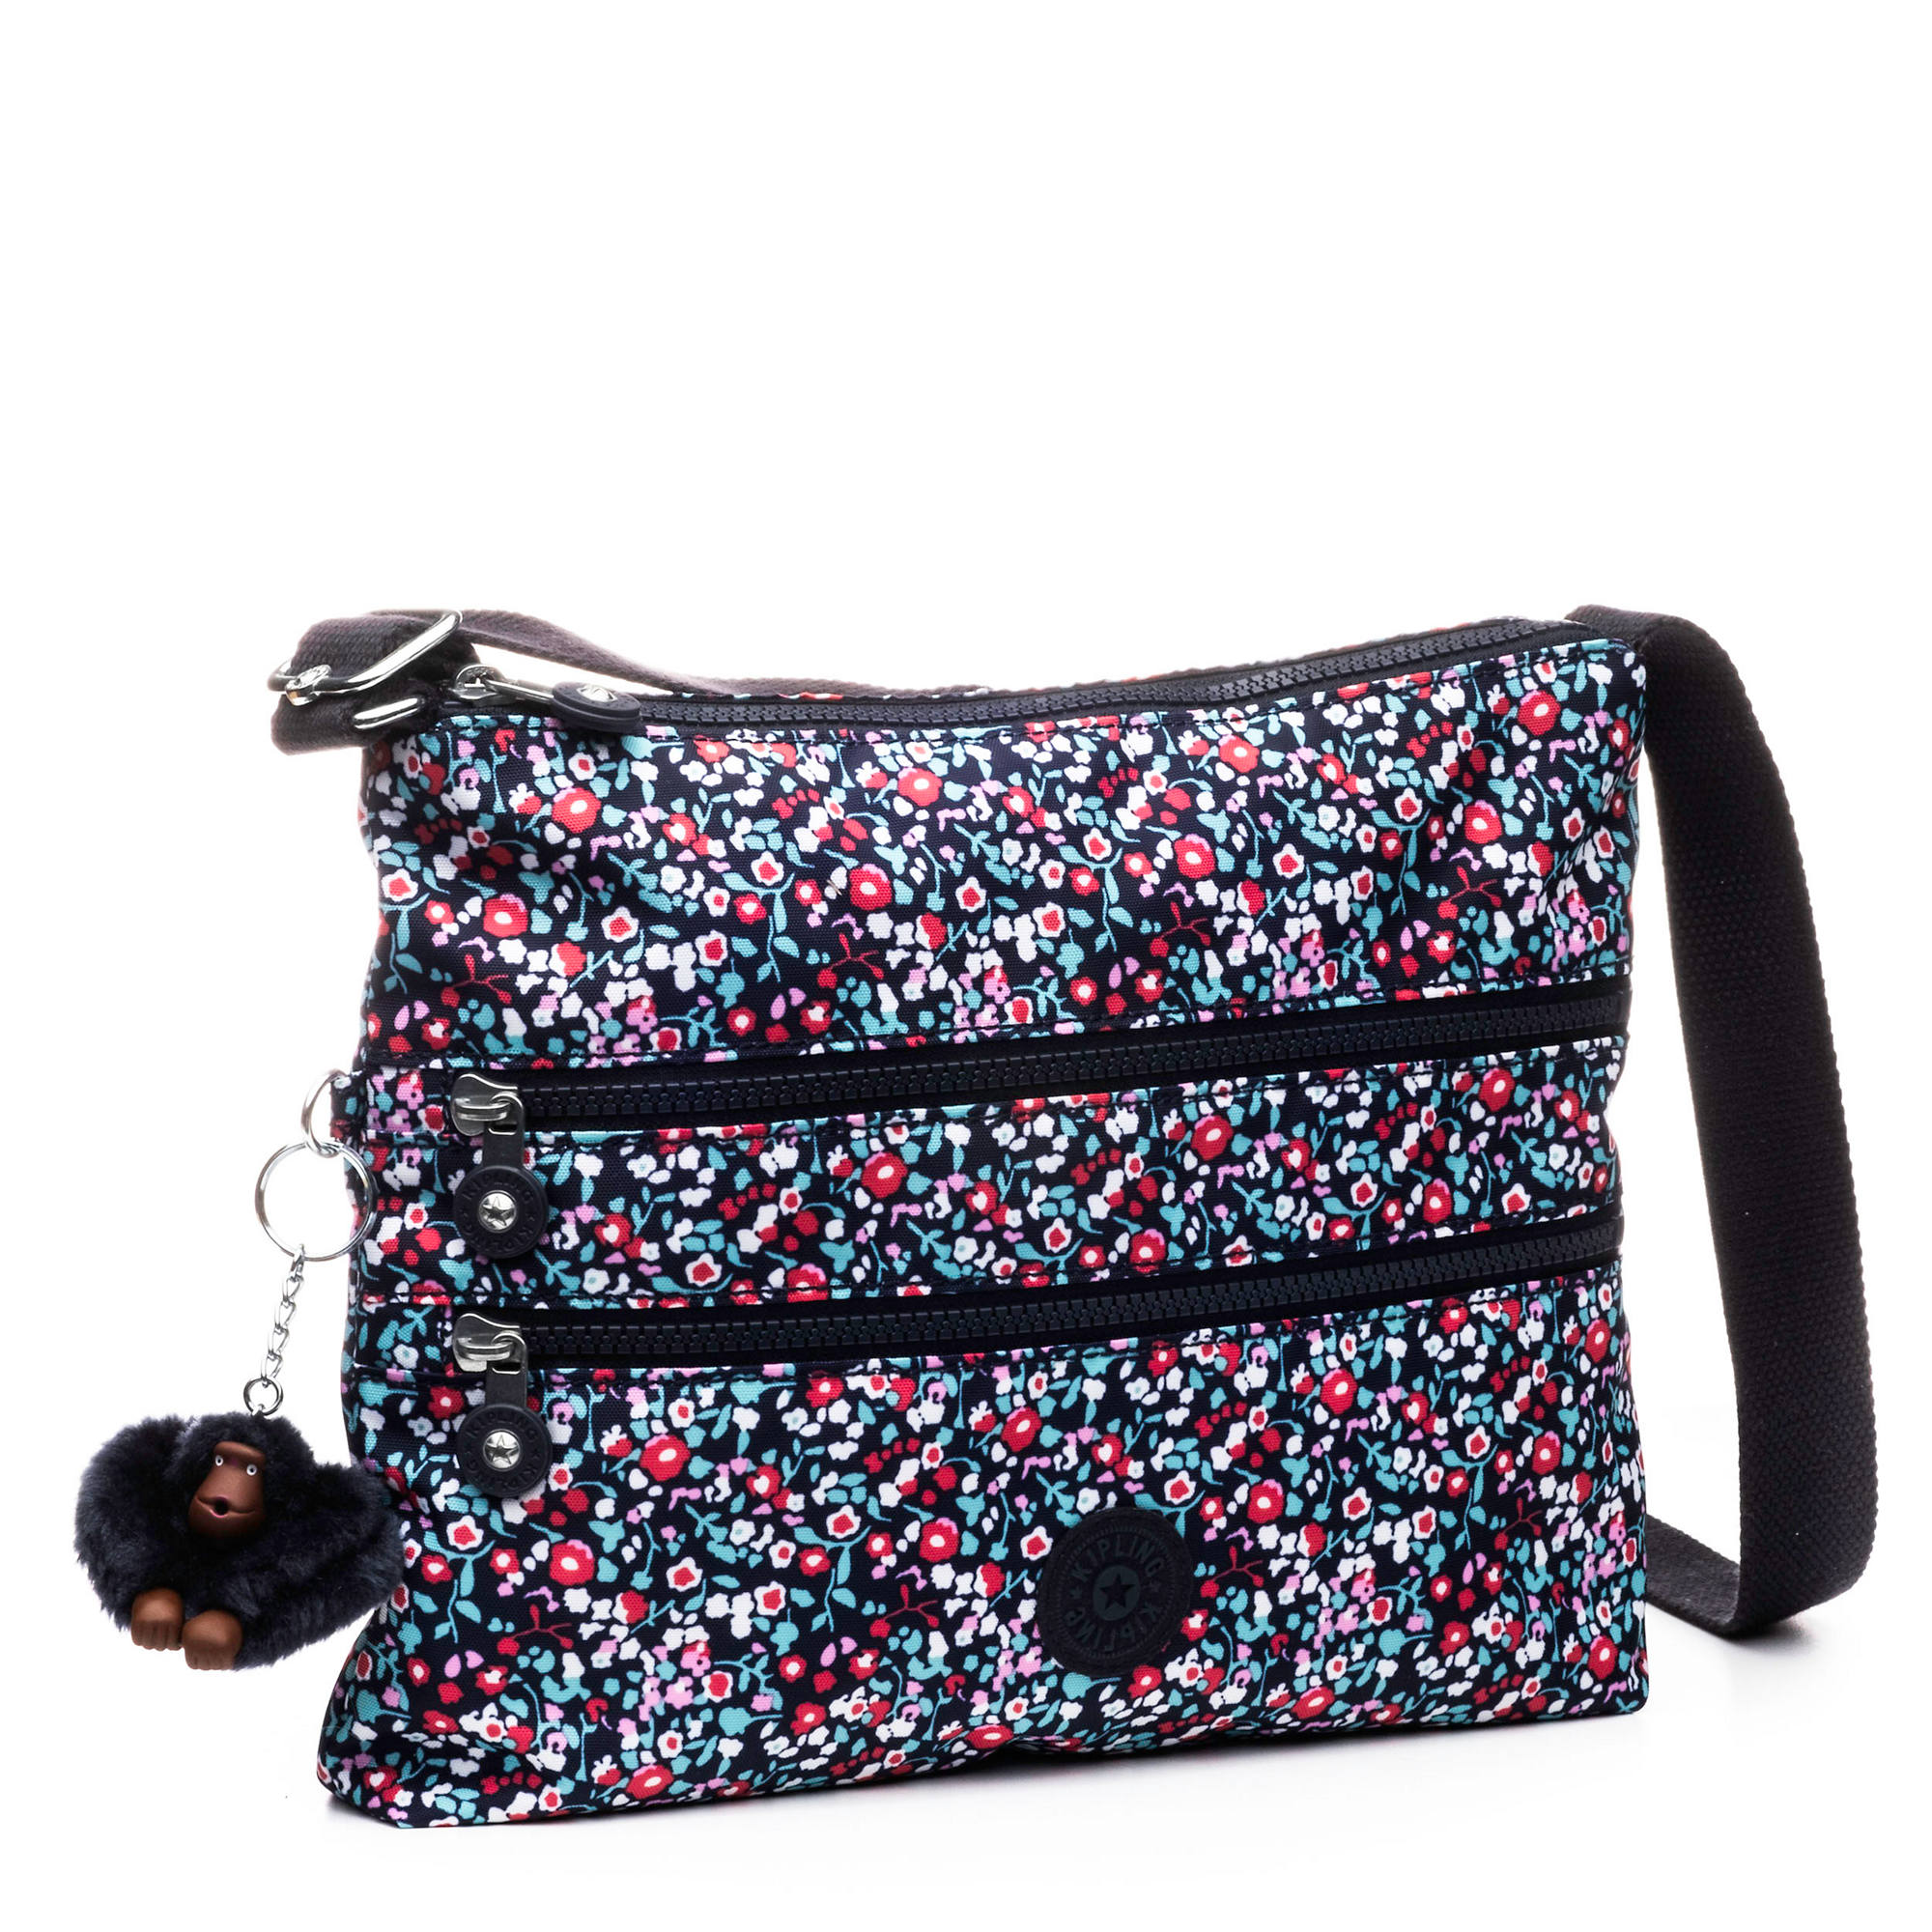 Kipling-Alvar-Metallic-Crossbody-Bag miniature 23